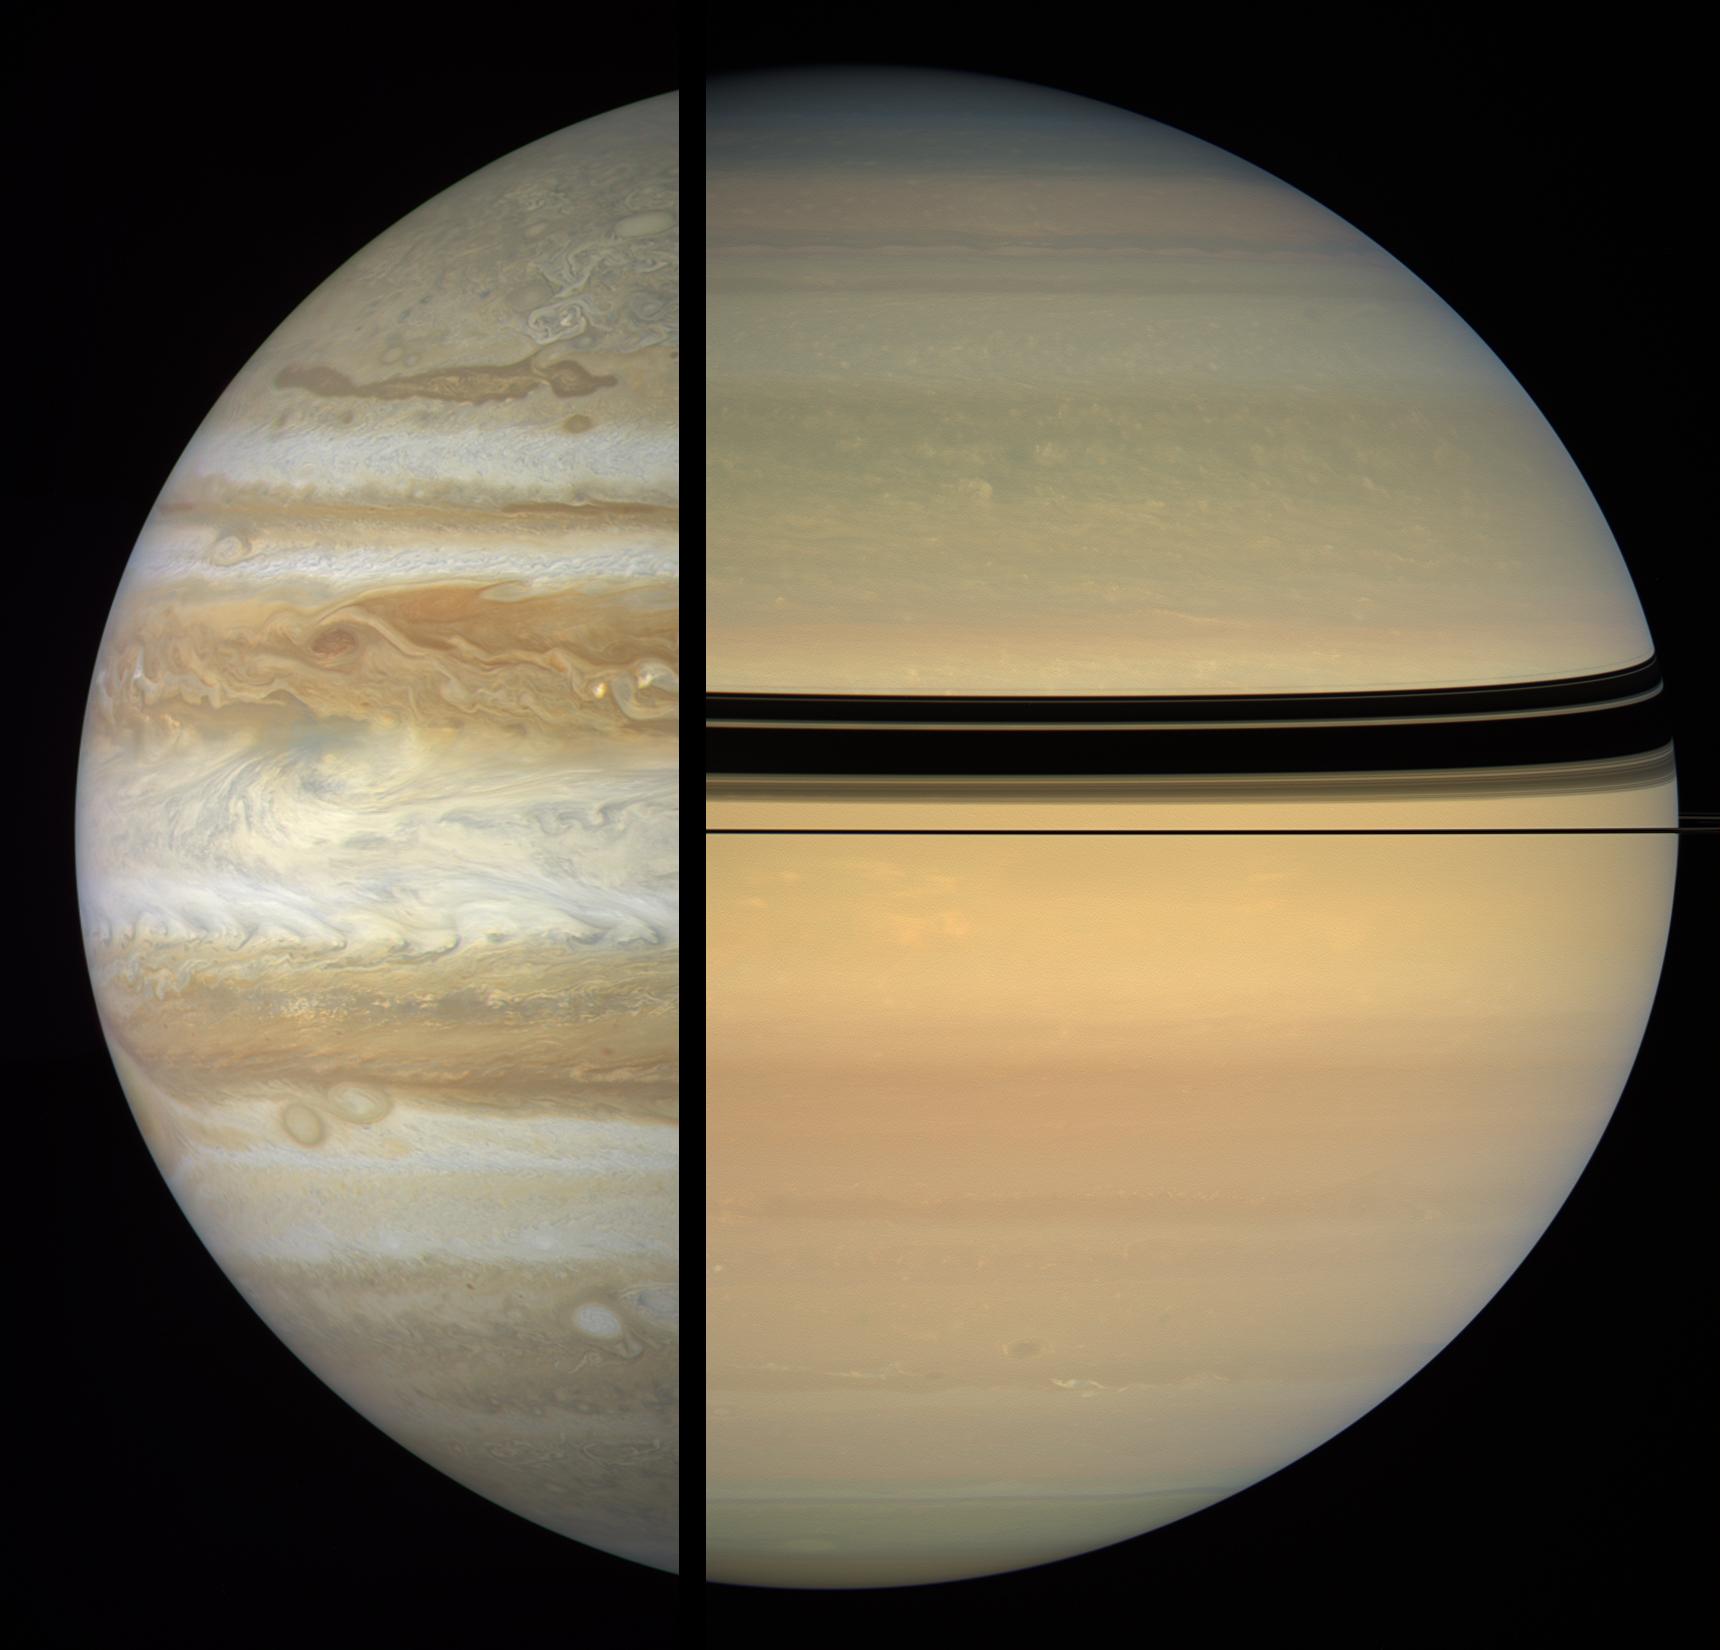 Сравнение Юпитера и Сатурна. Масштаб не соблюден.